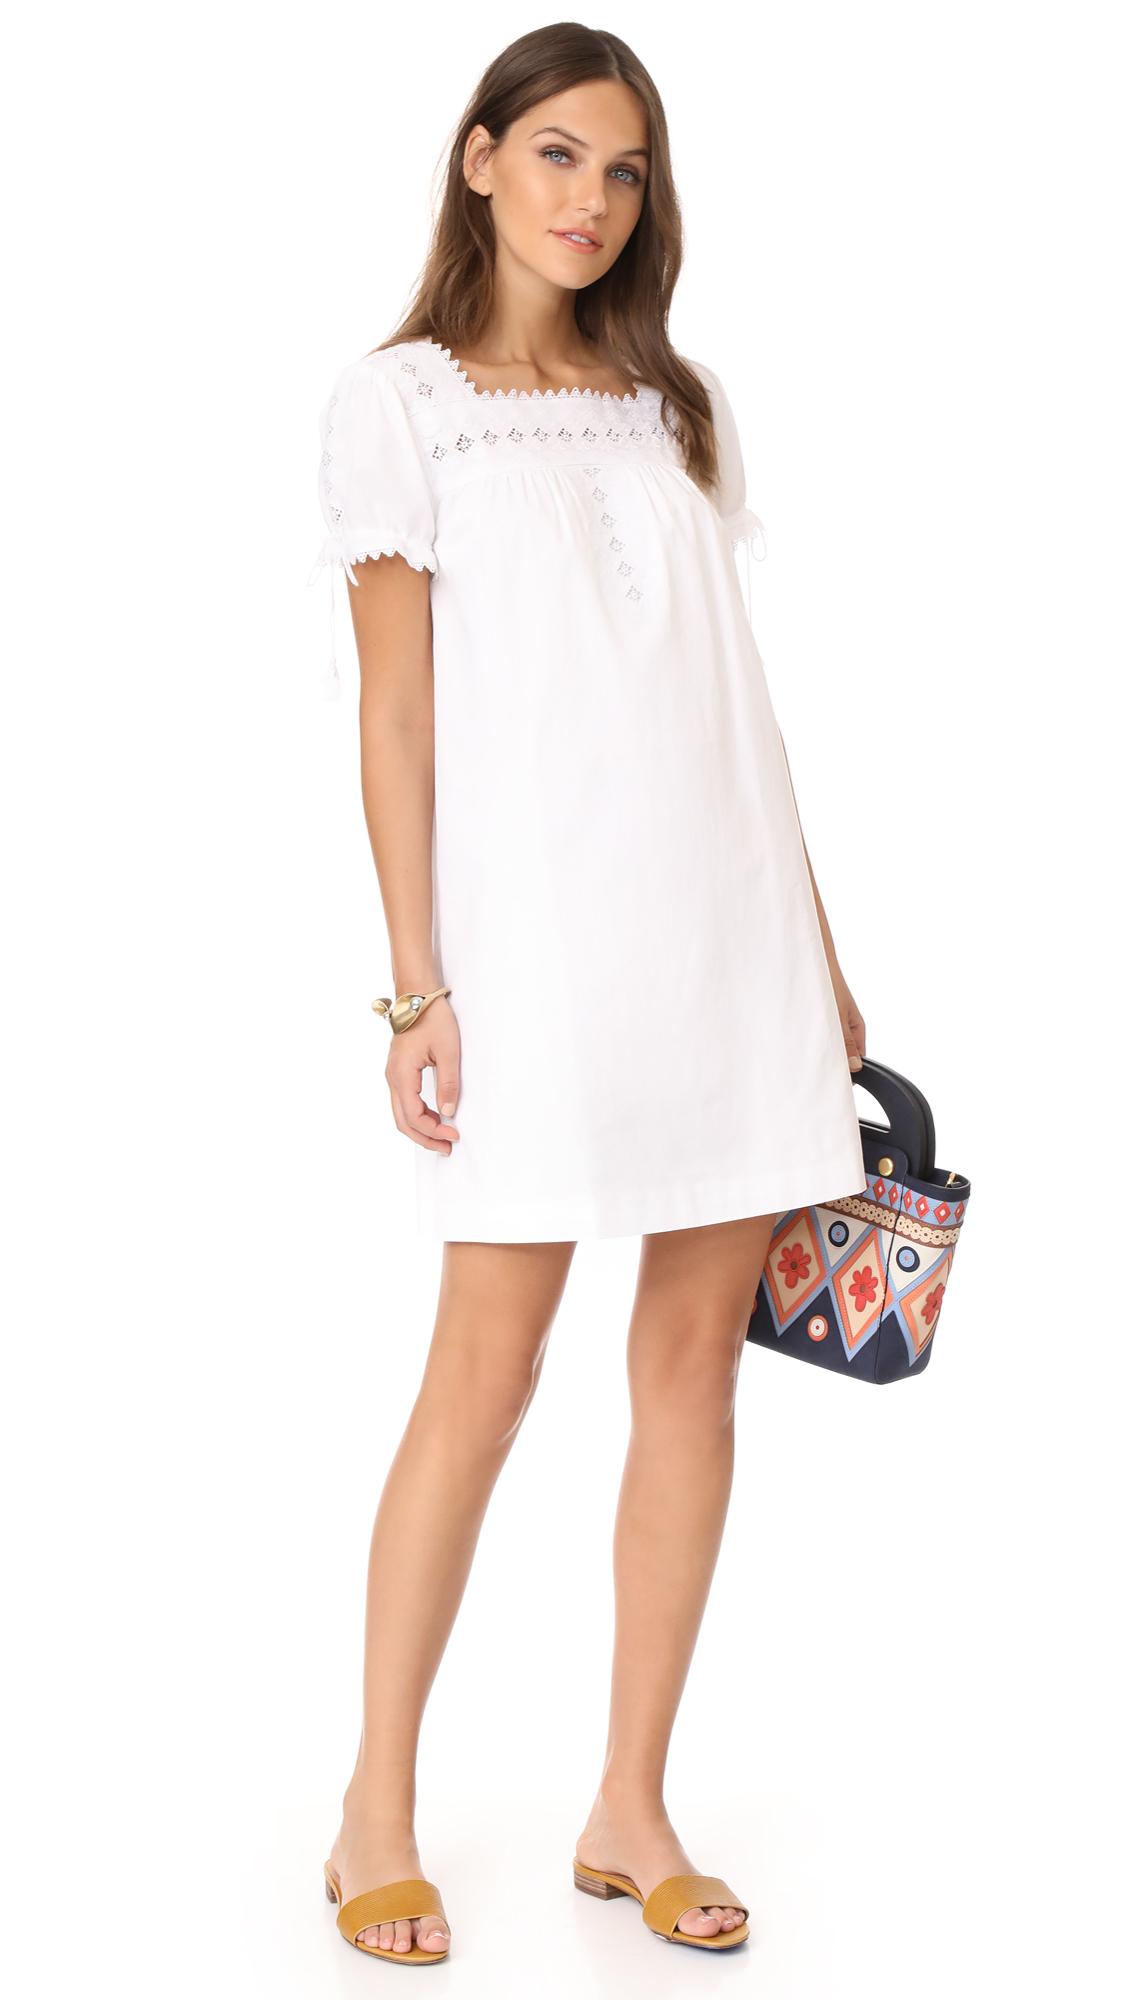 076c8e2d225a Madewell Eyelet Shift Dress | SHOPBOP